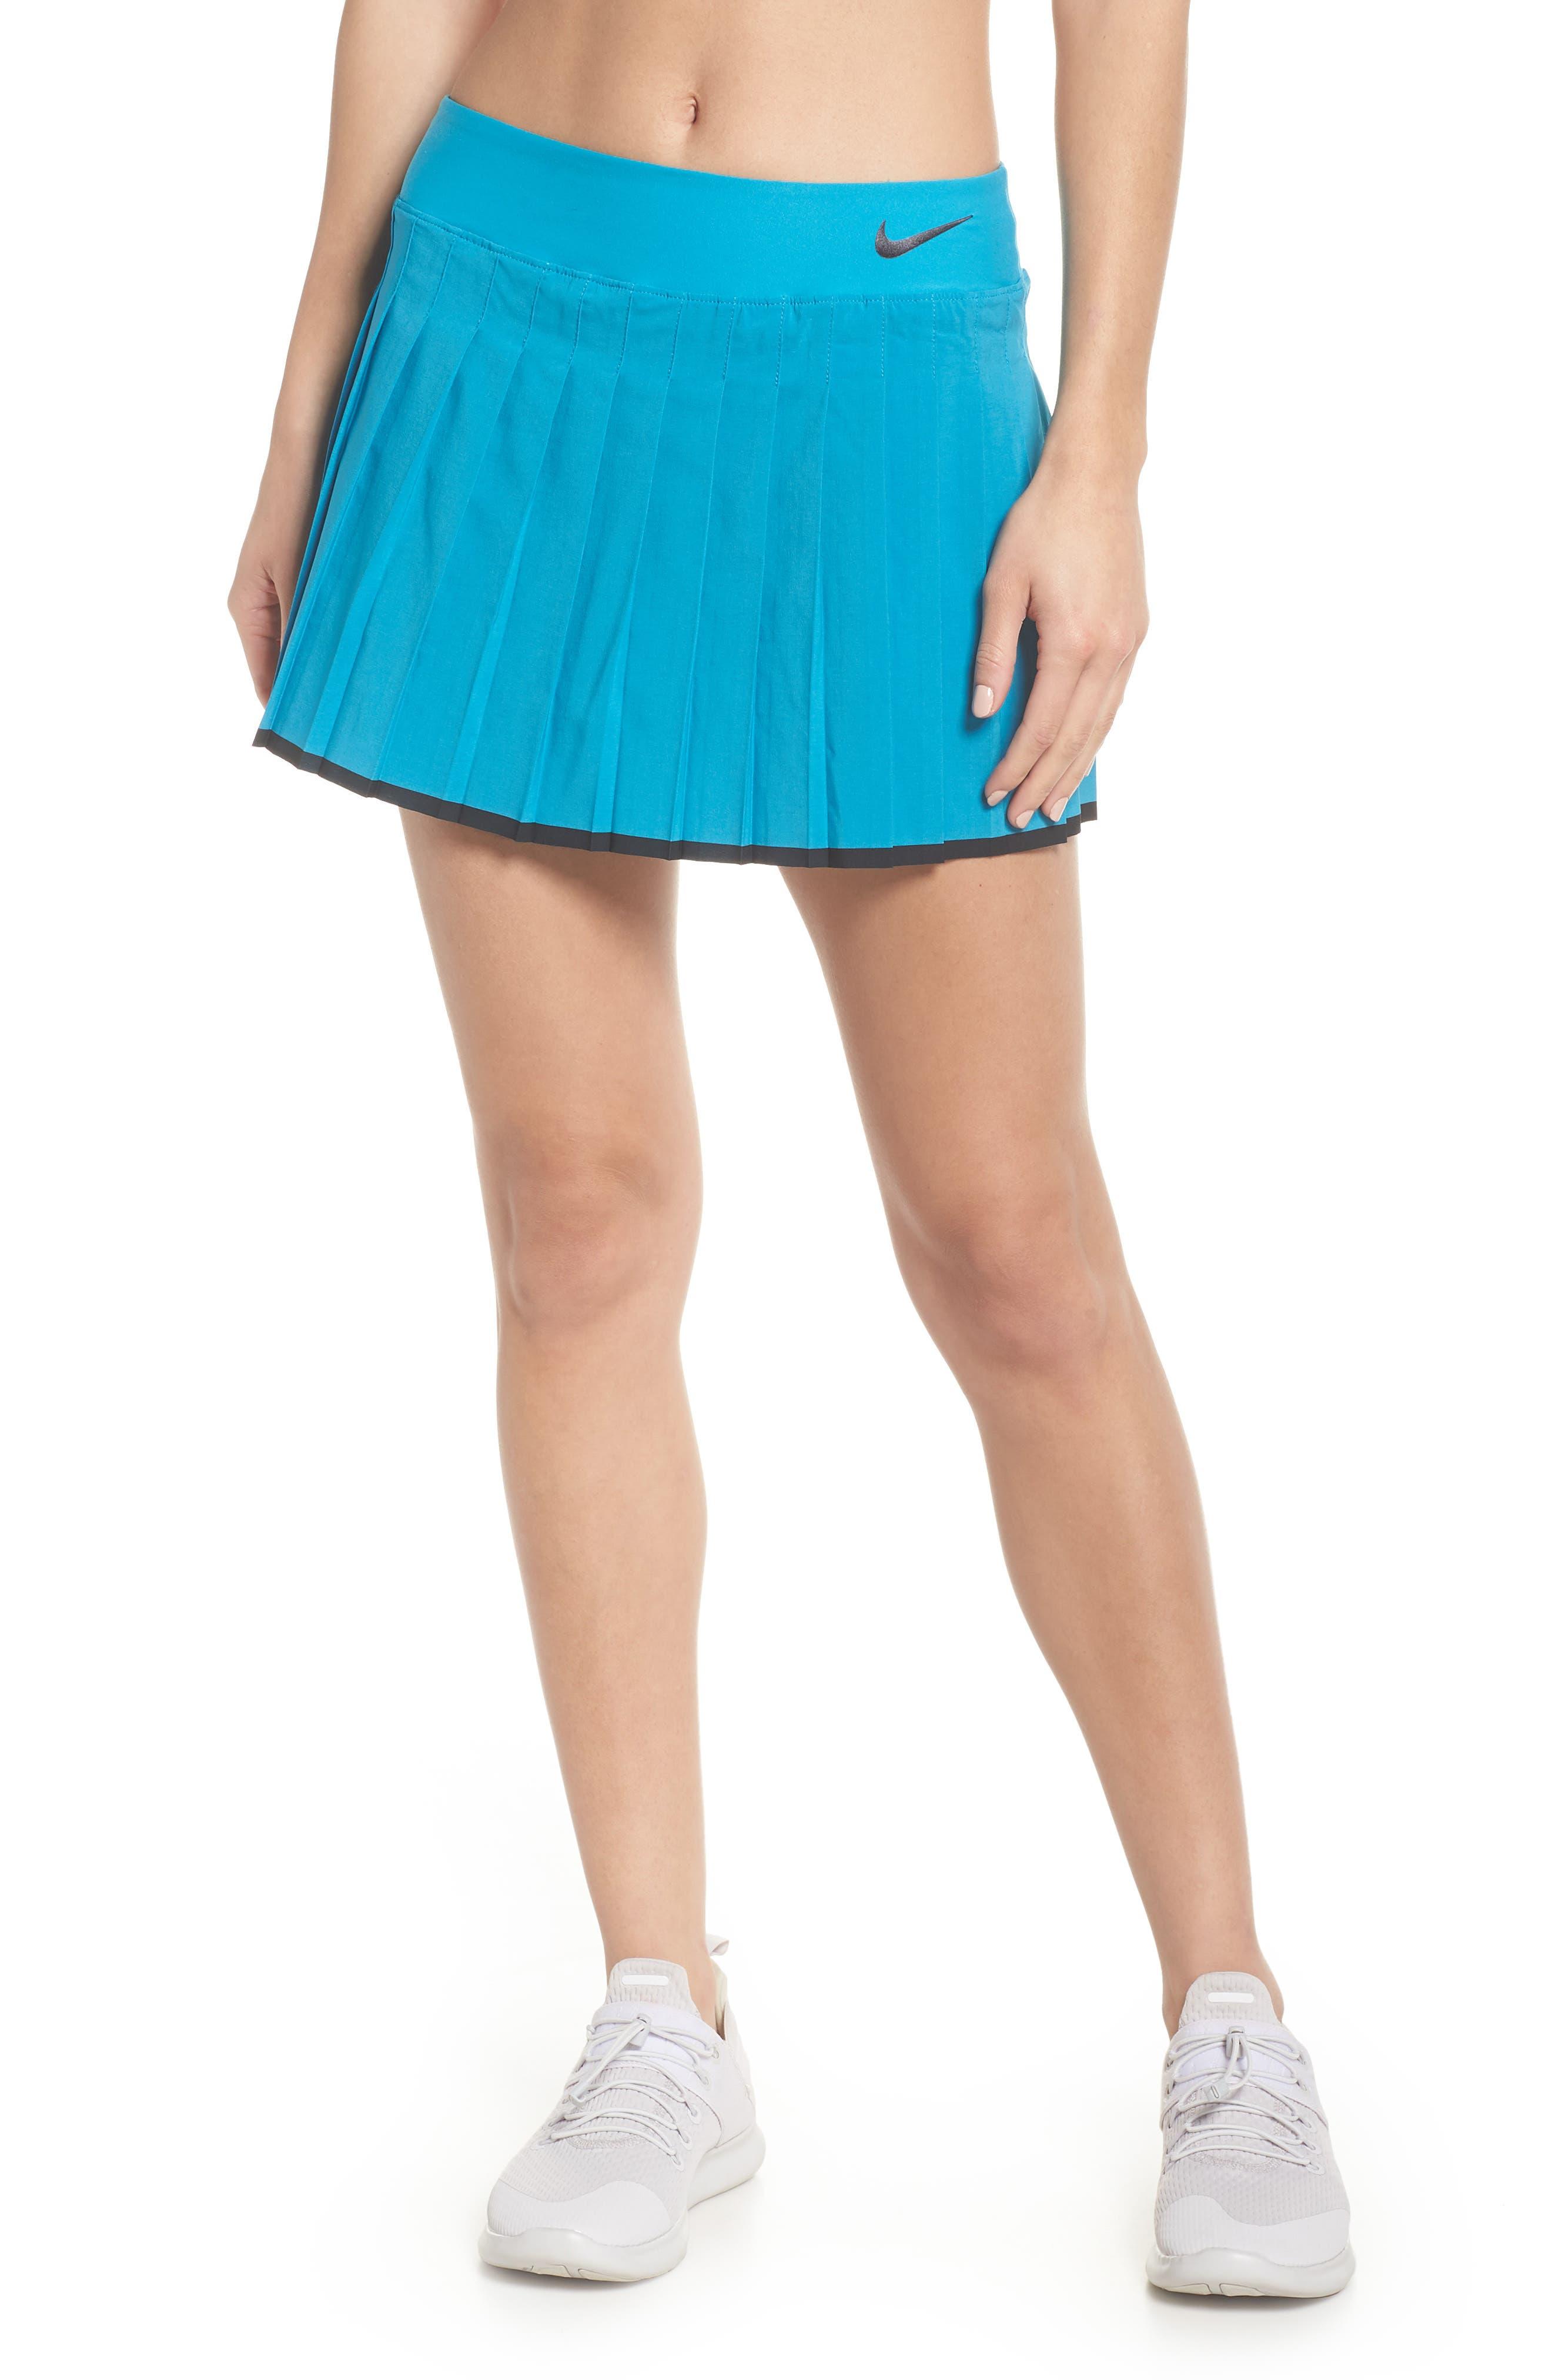 'Victory' Pleat Dri-FIT Tennis Skirt,                             Main thumbnail 1, color,                             Neo Turquoise/ Black